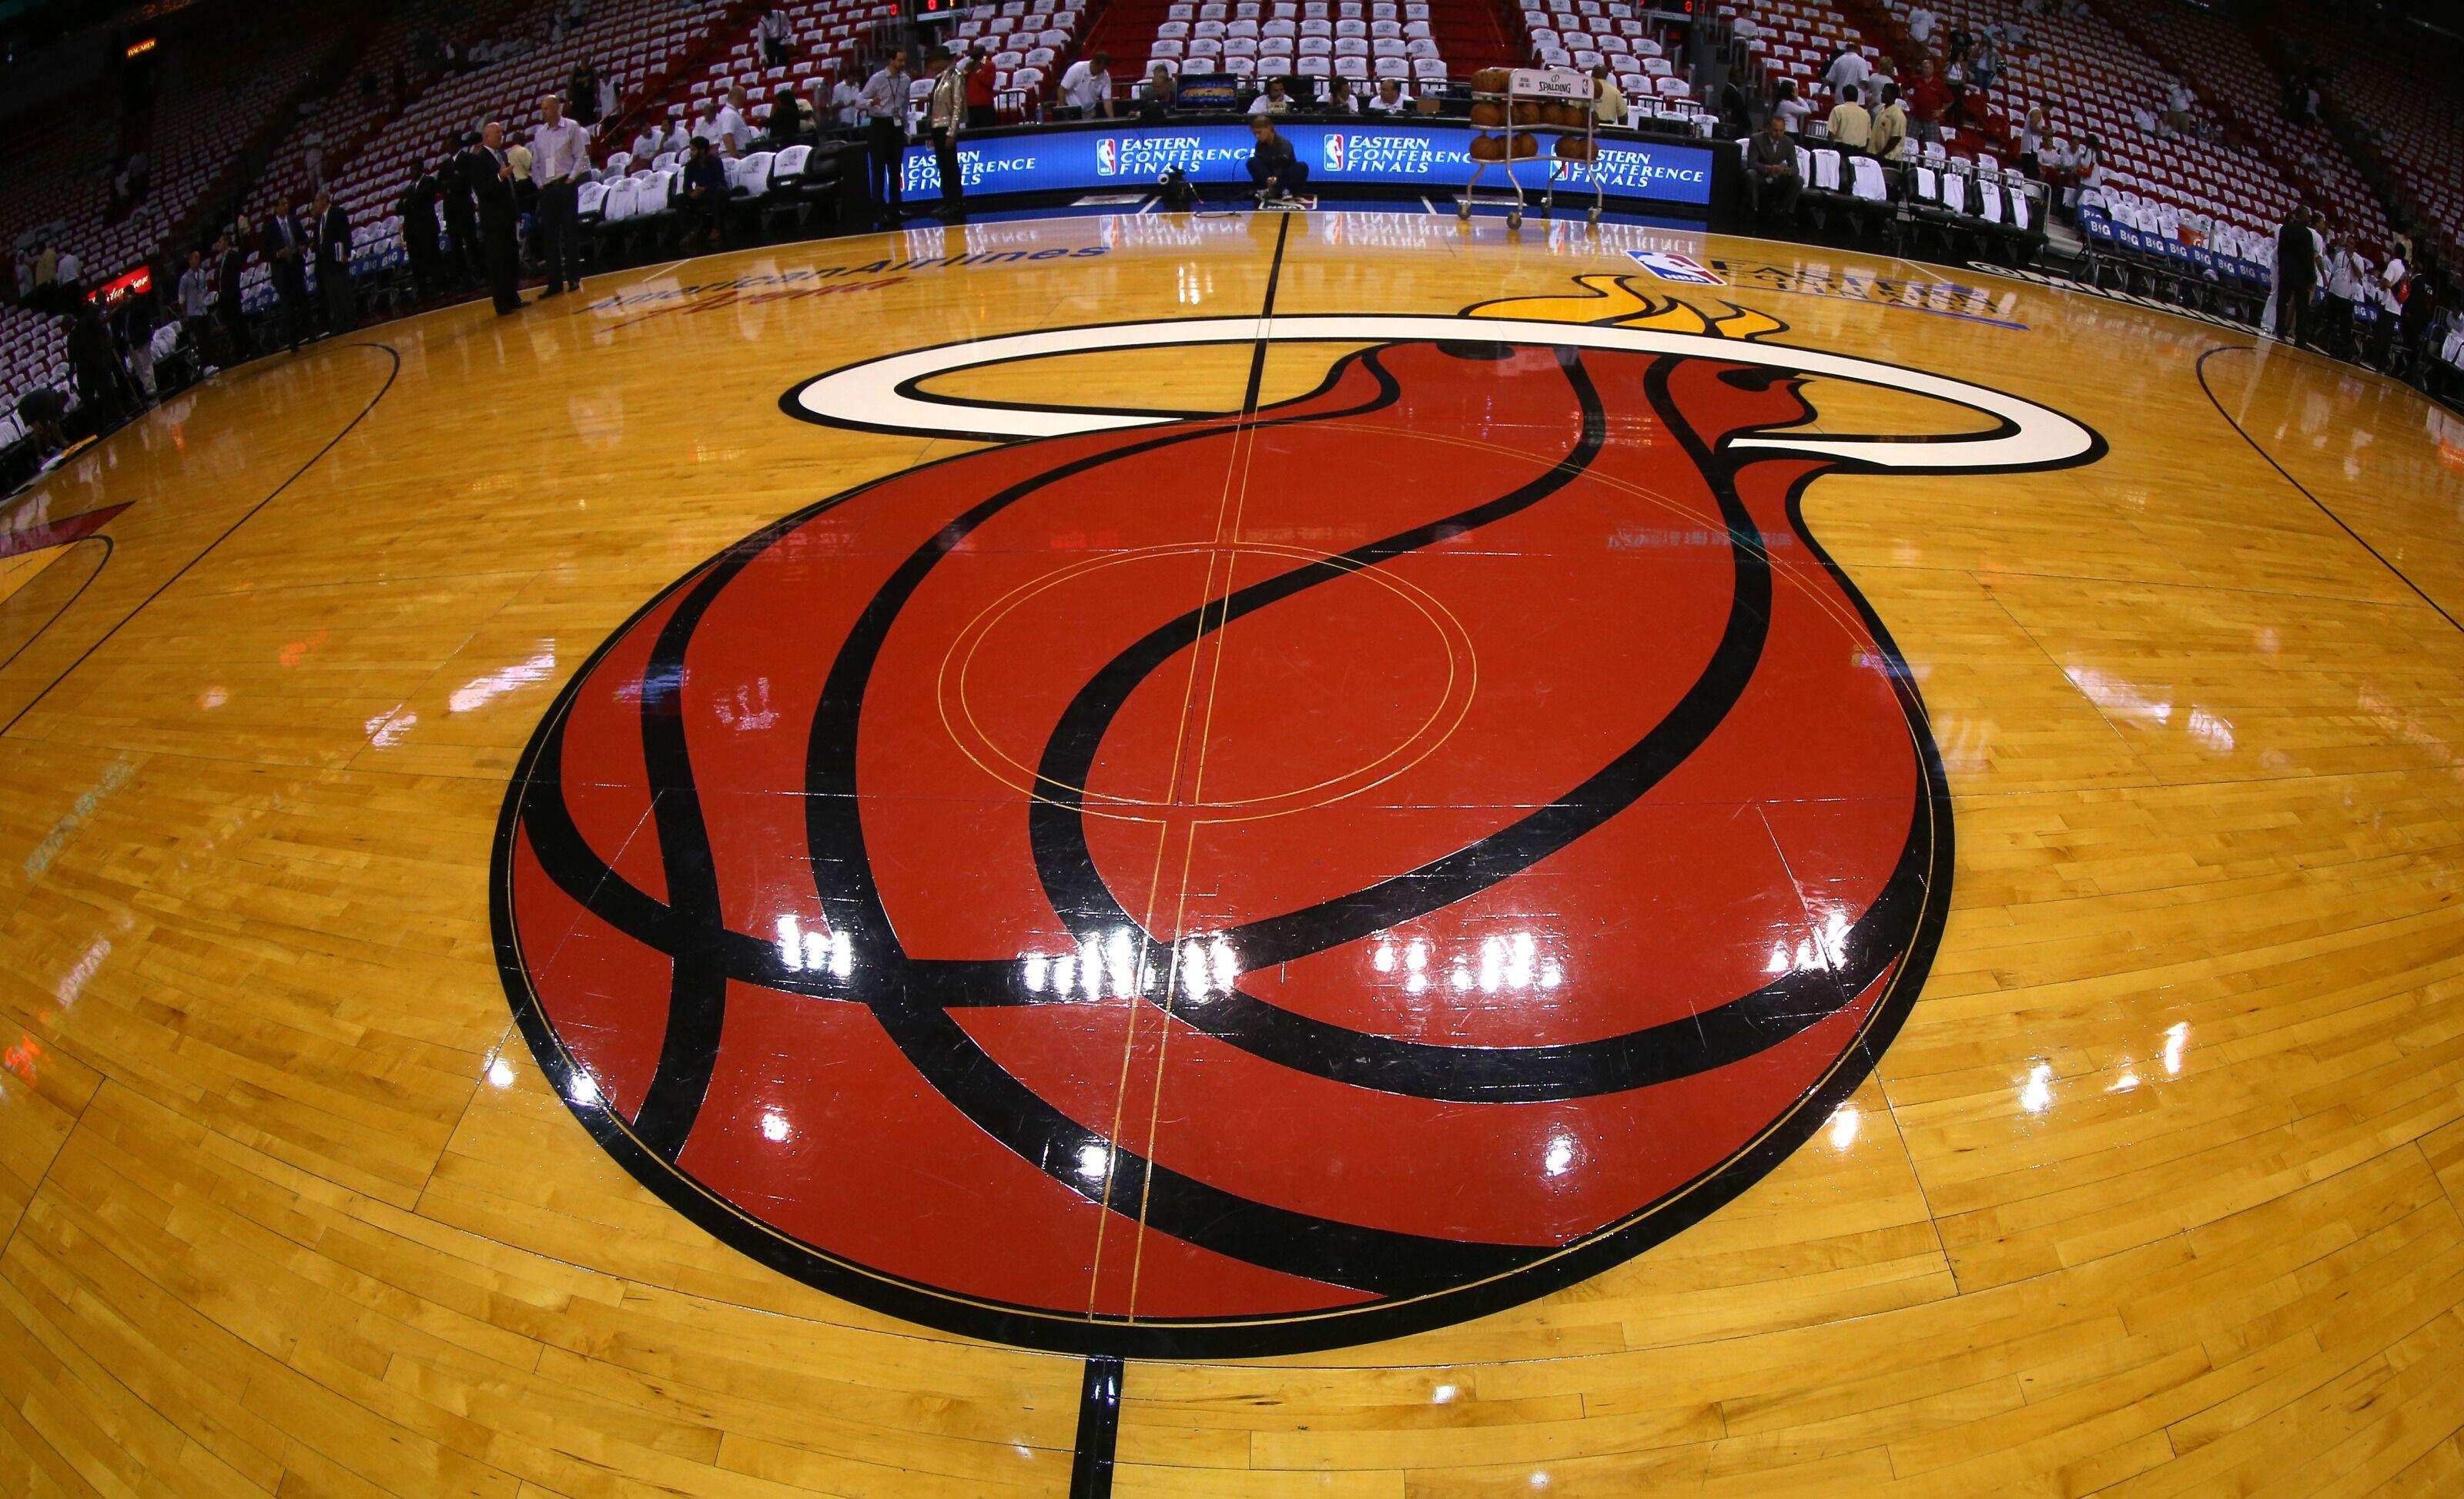 Grizzlies vs. Heat: Odds, injuries, Dion Waiters suspension impactful?